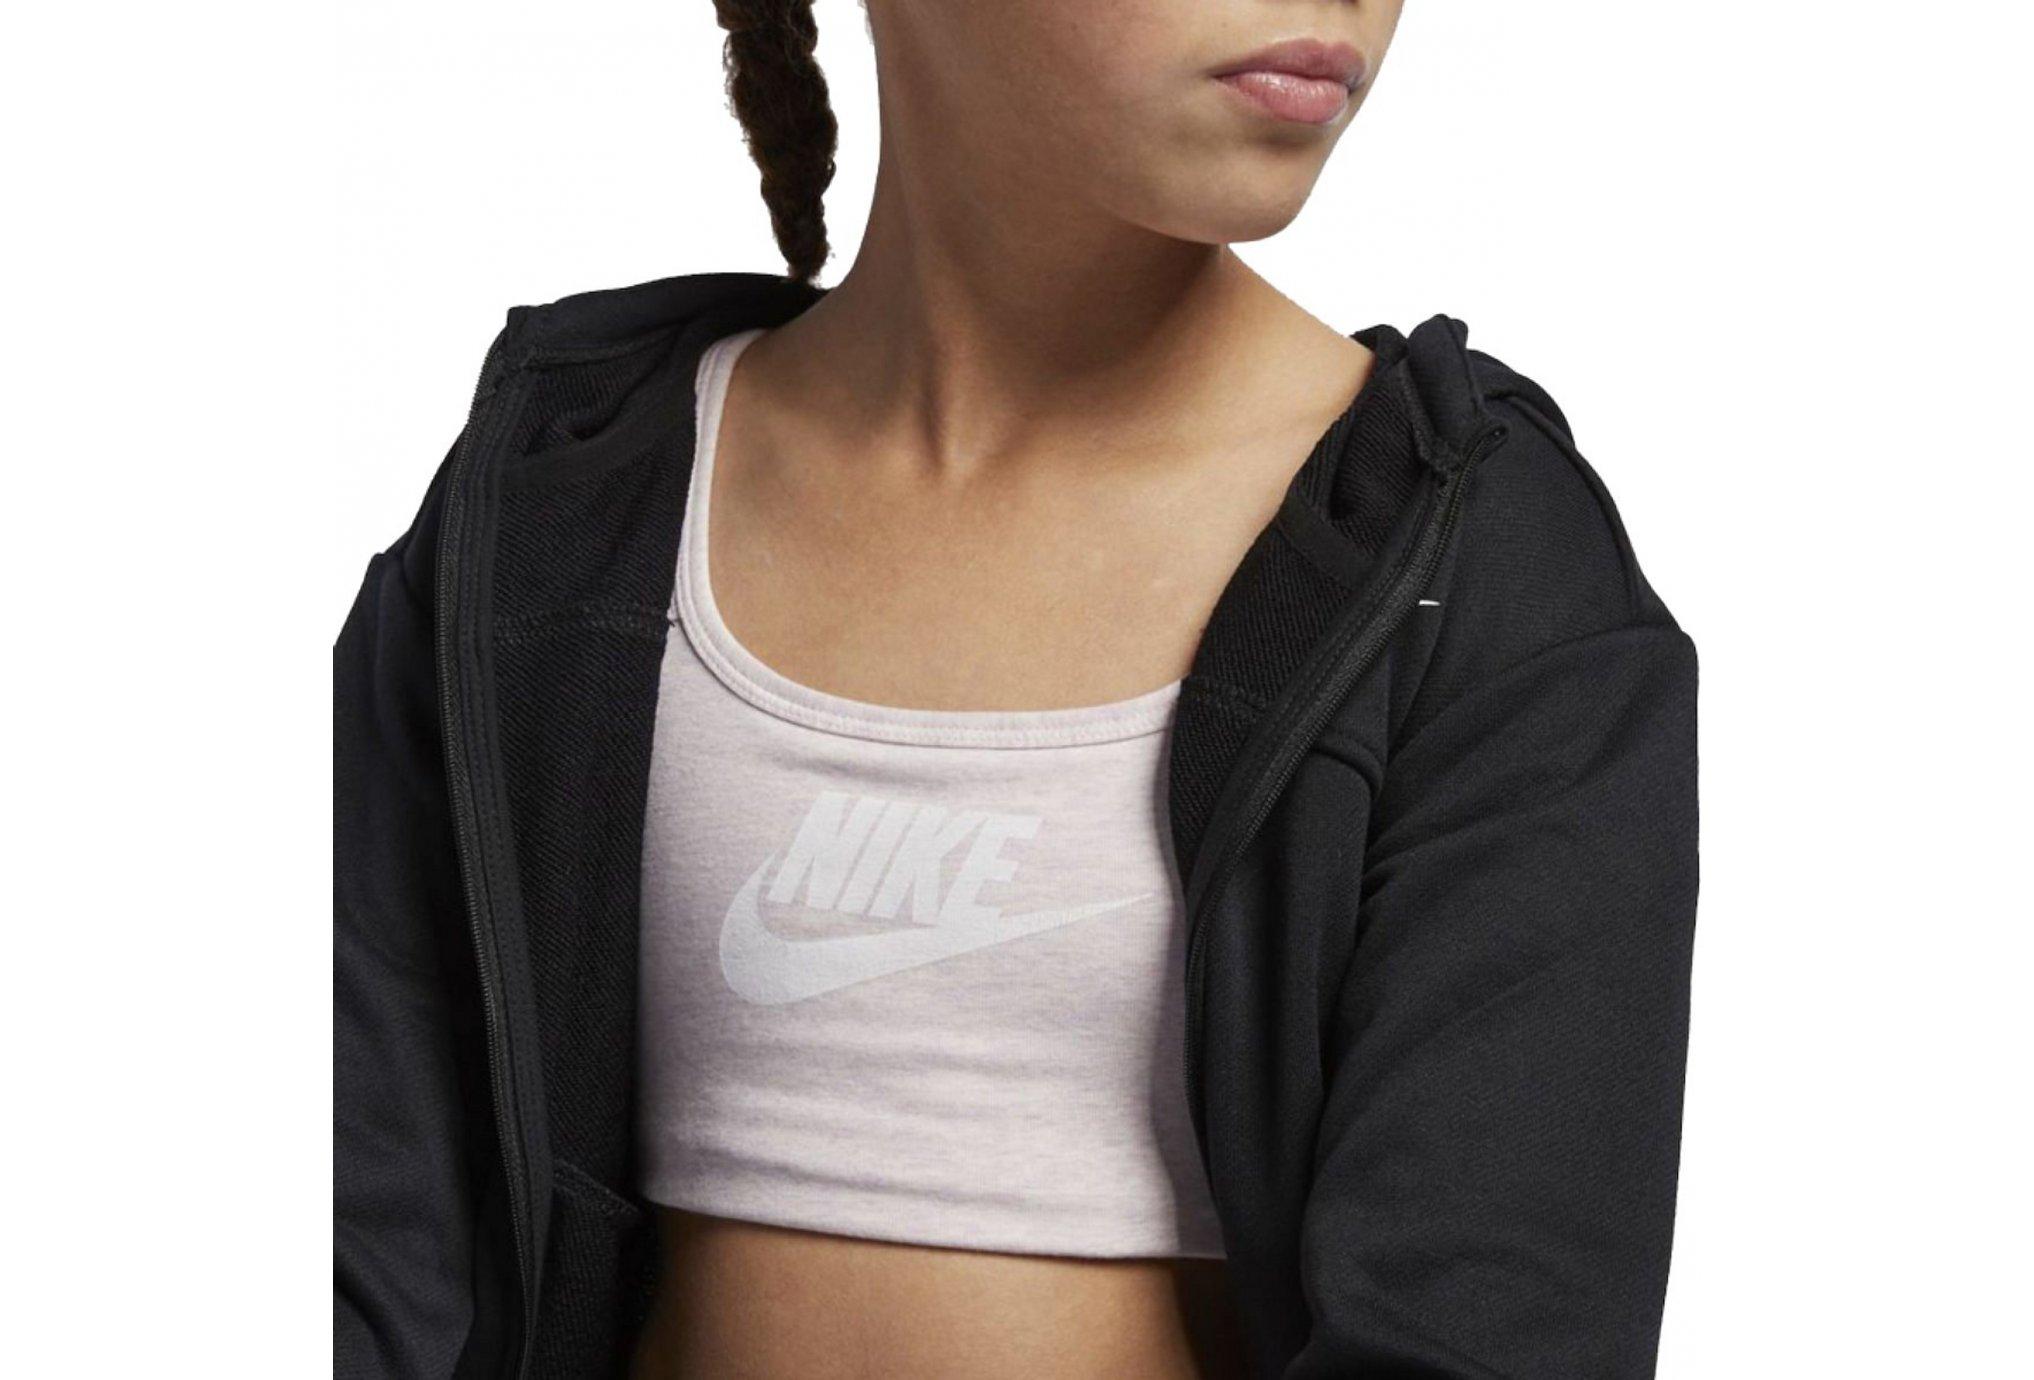 Nike Sportswear Fille vêtement running femme